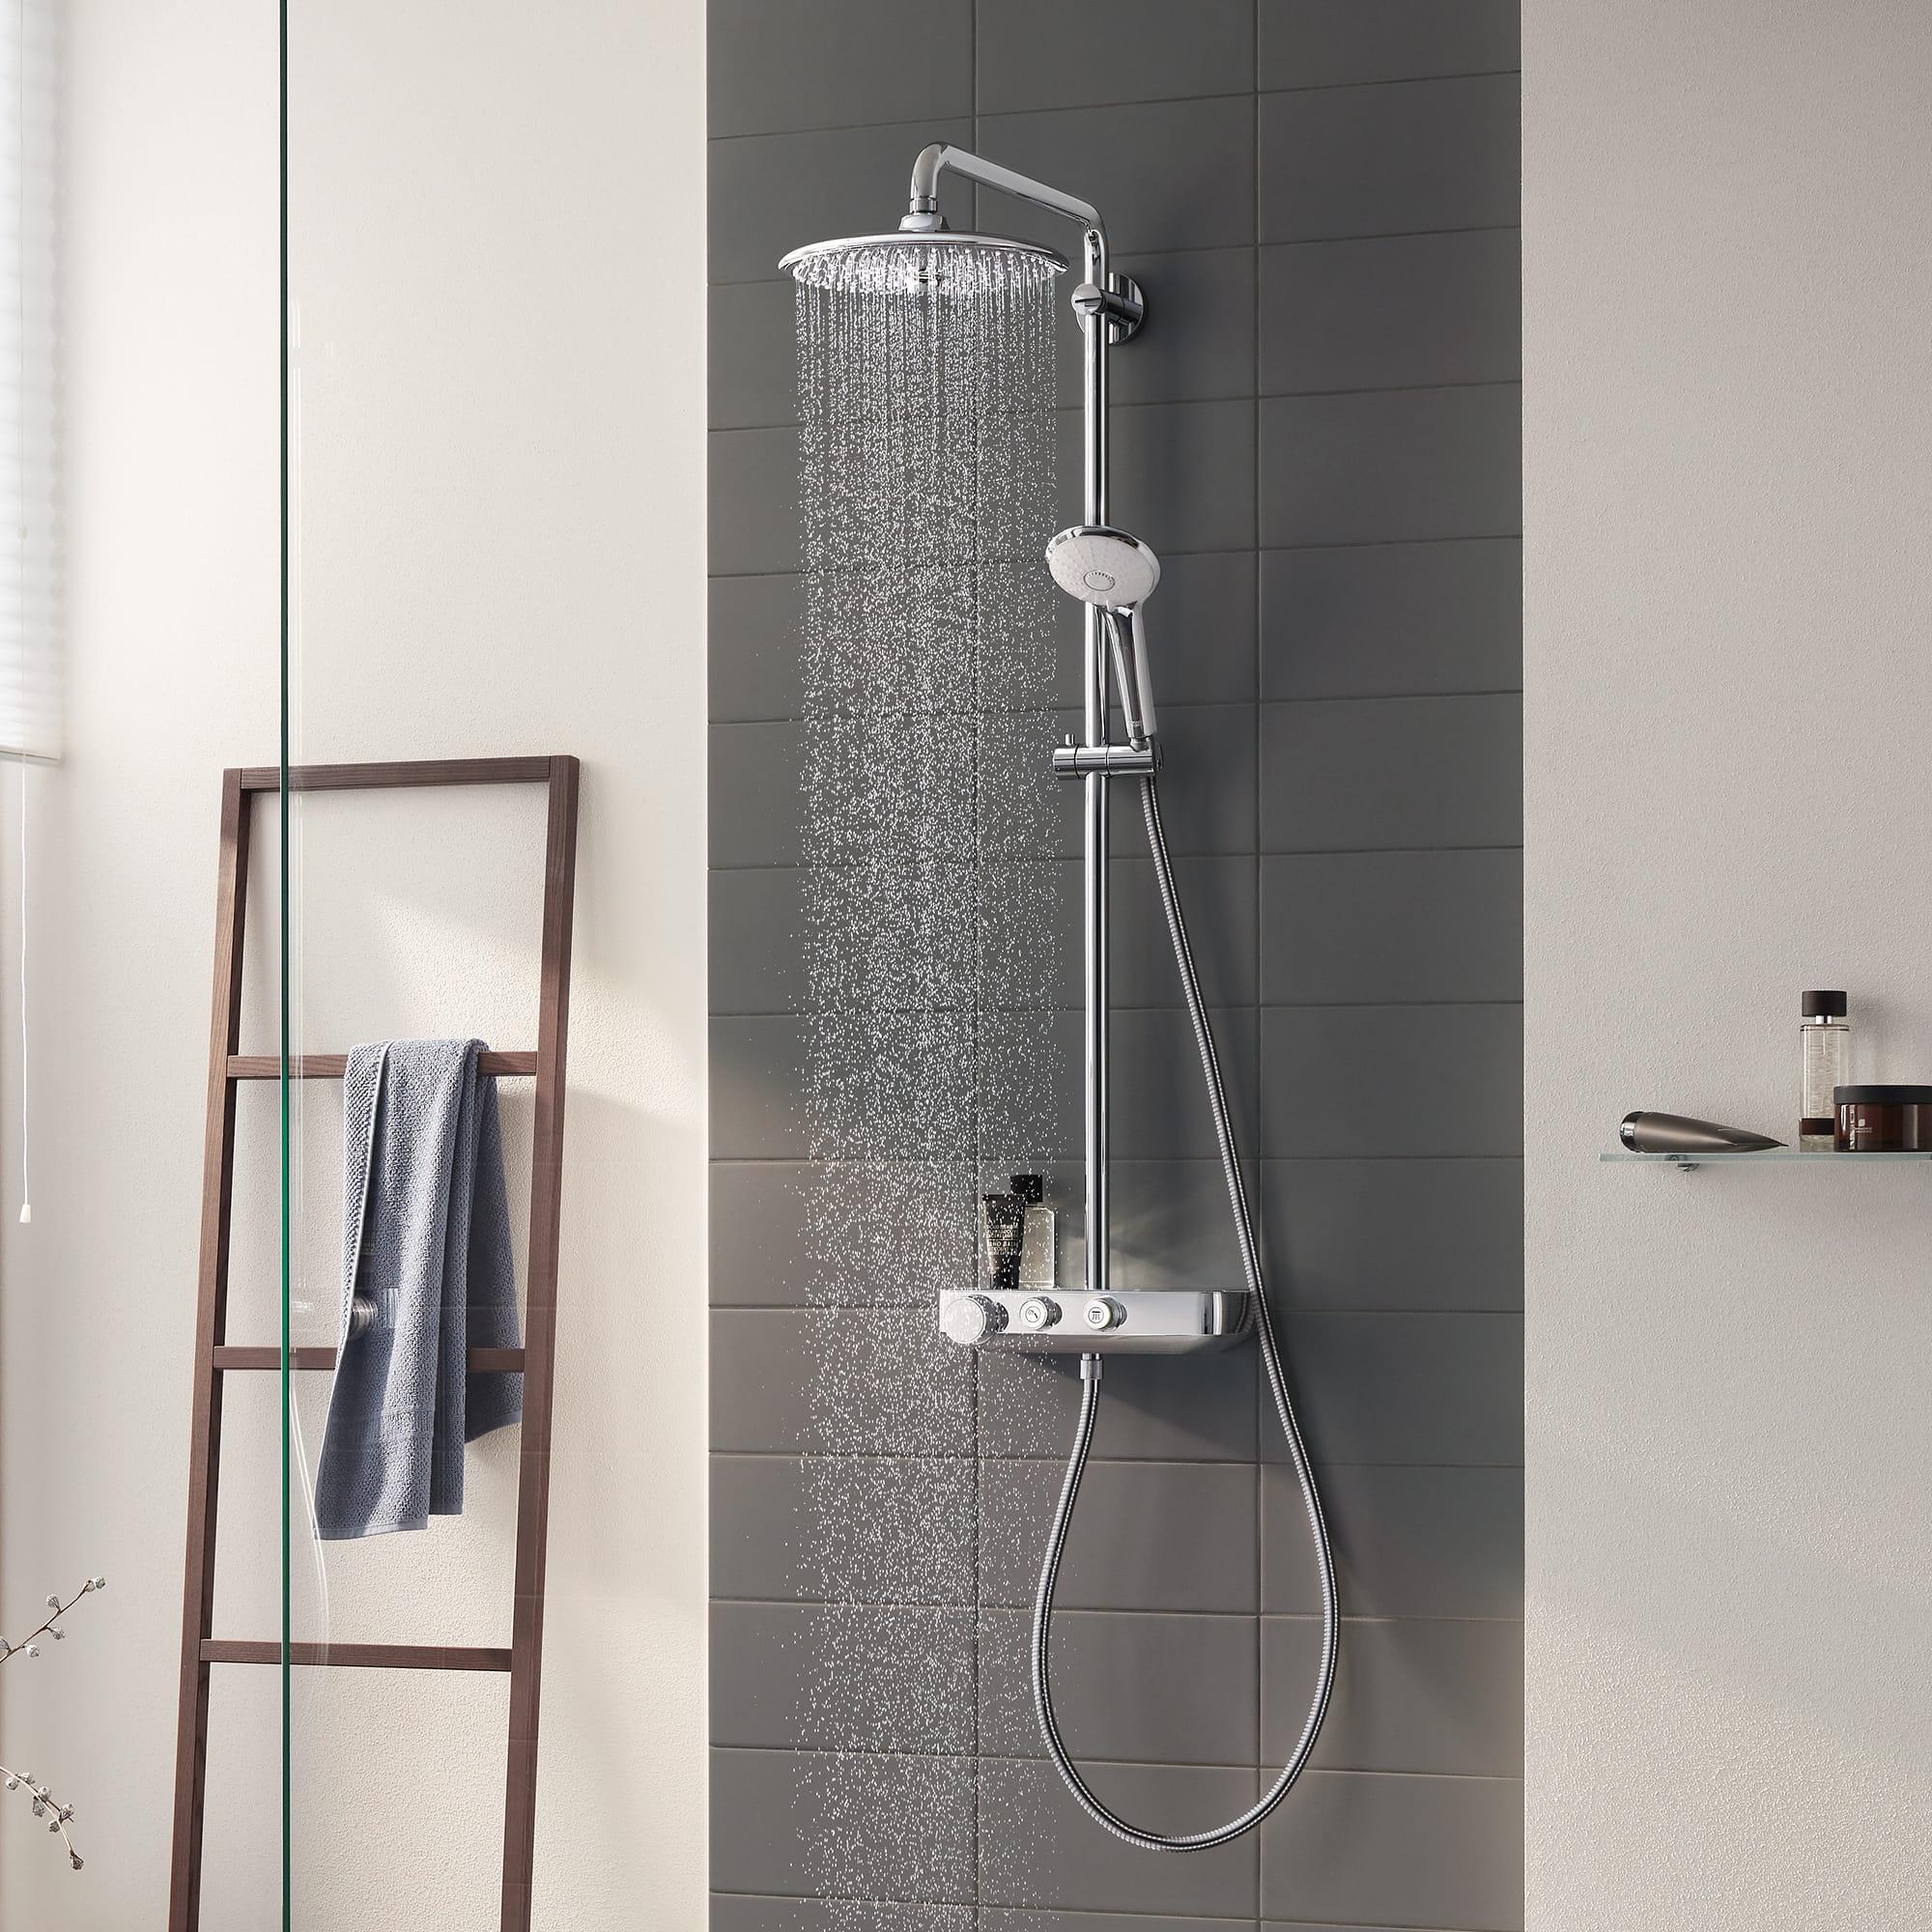 Euphoria SmartControl shower water spray